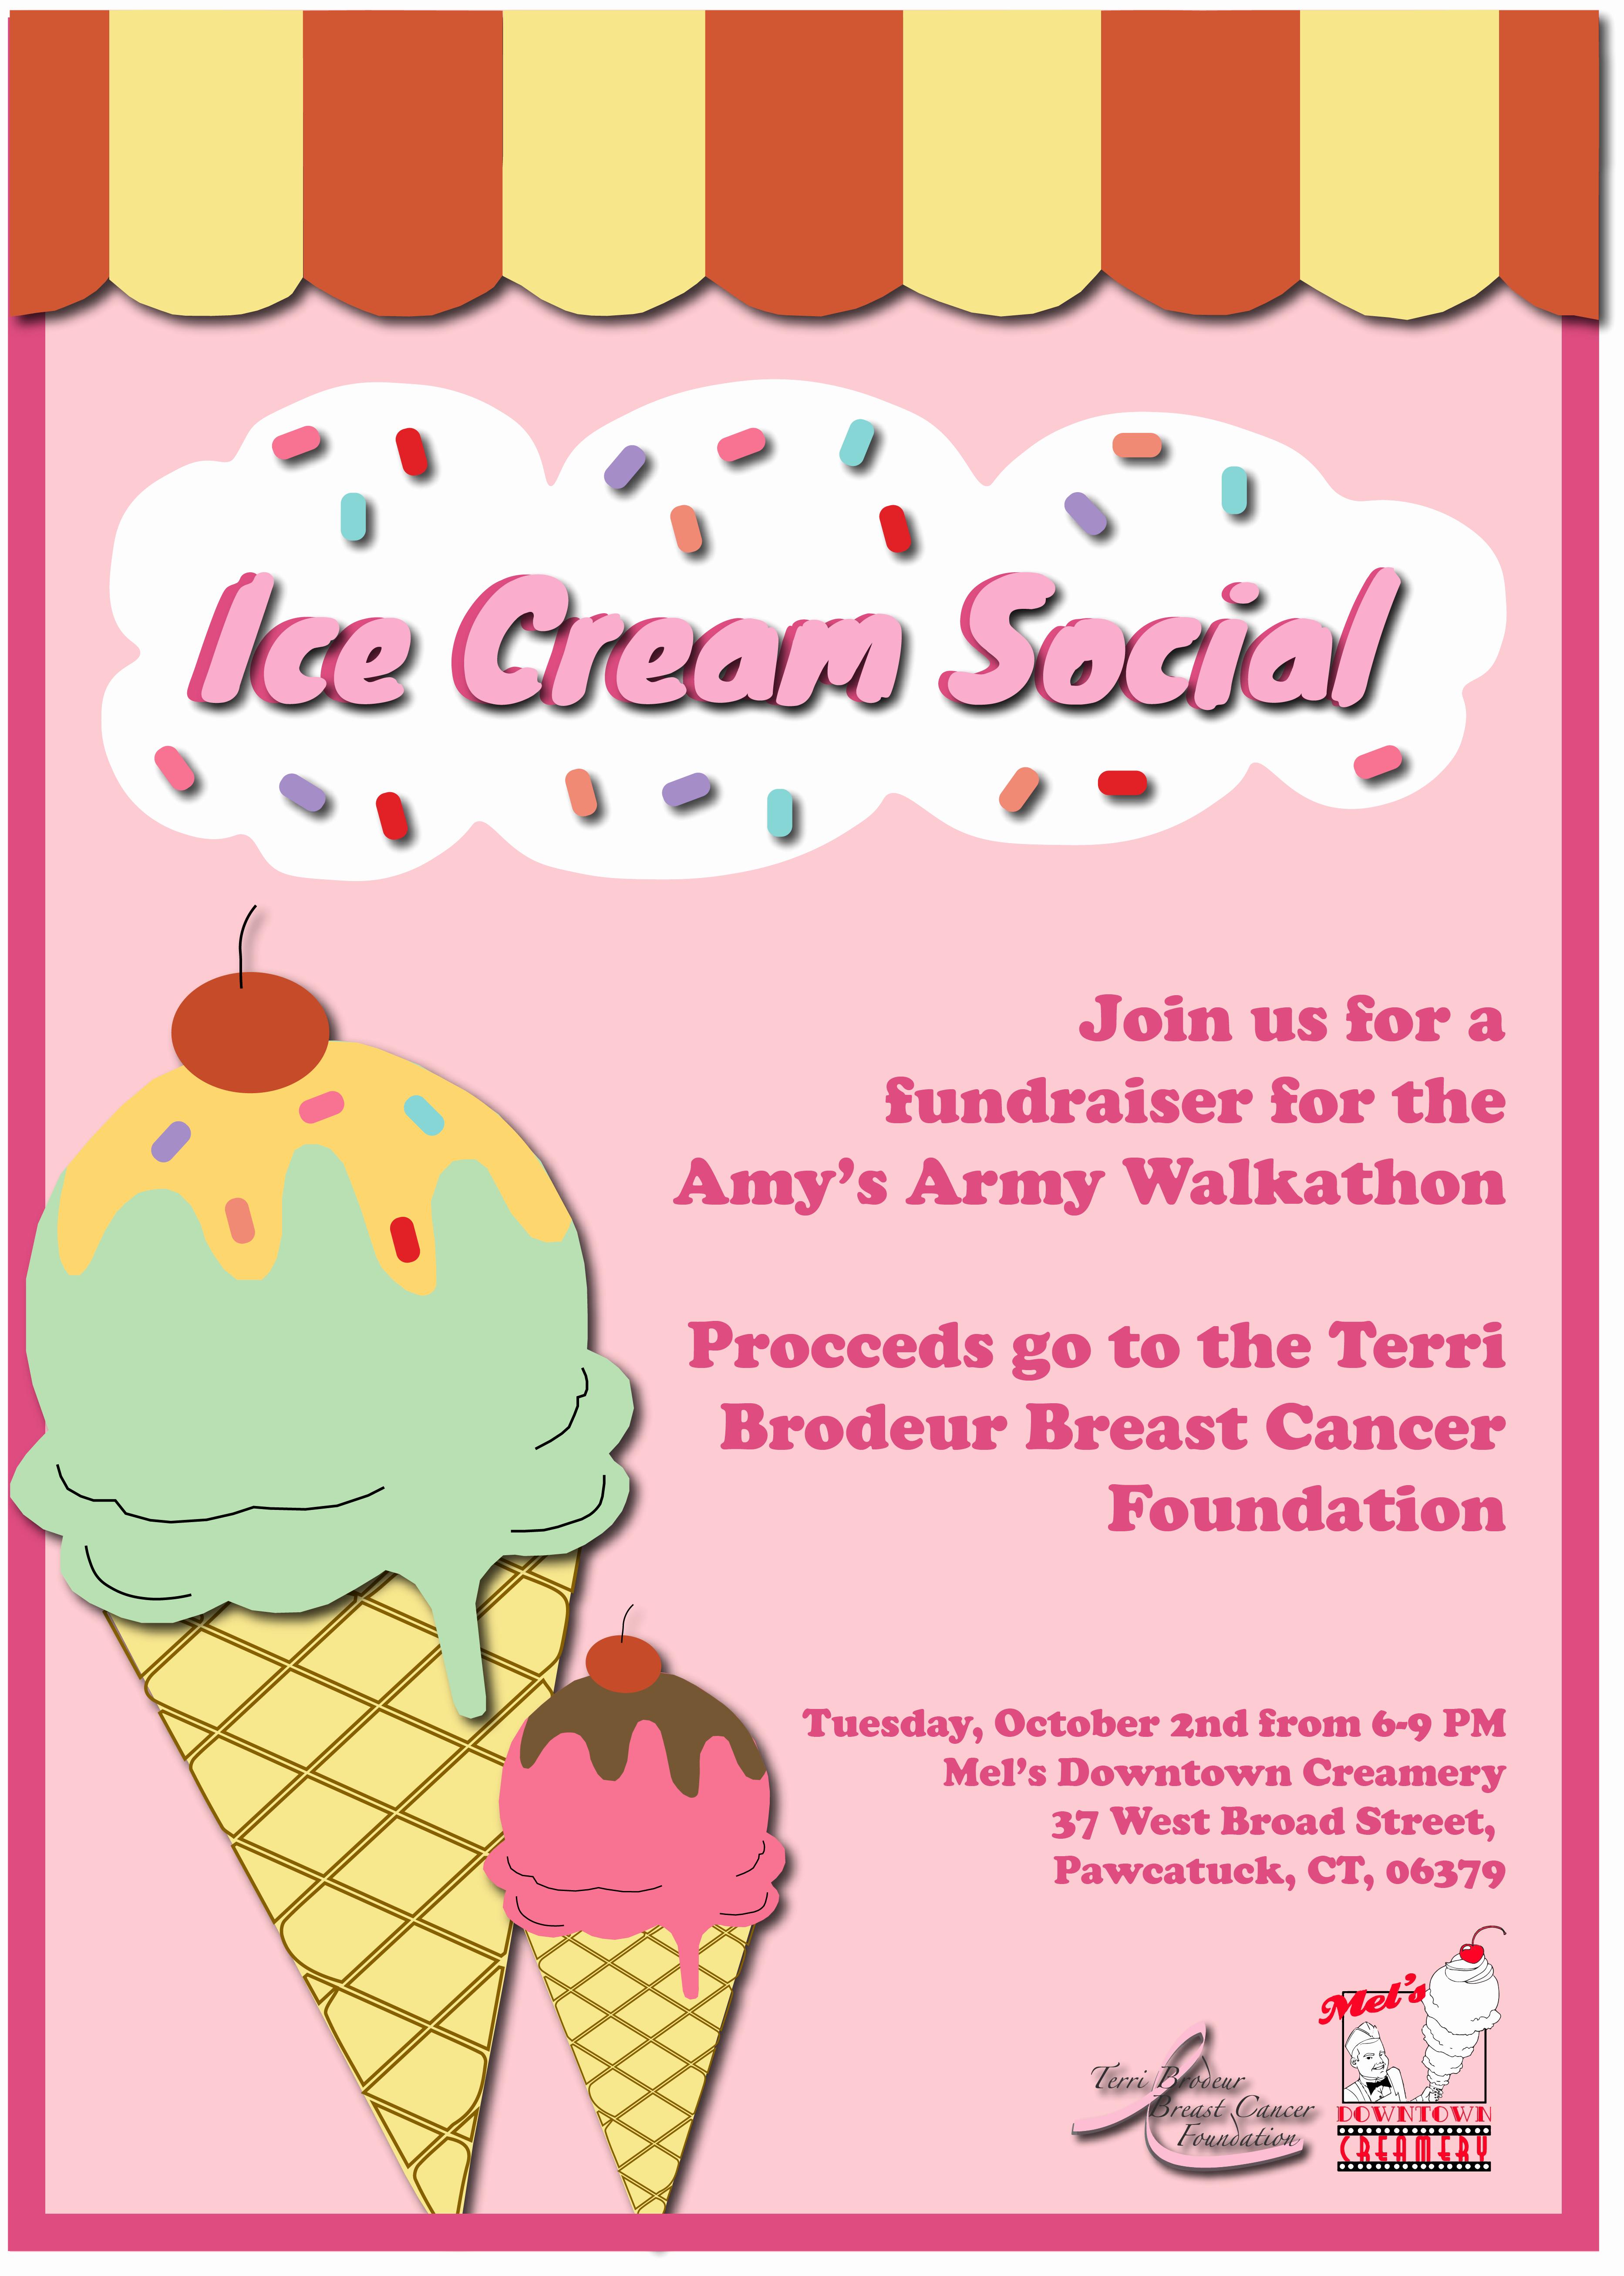 Ice Cream social Flyer Template Lovely Ice Cream social Flyer Terri Brodeur Breast Cancer